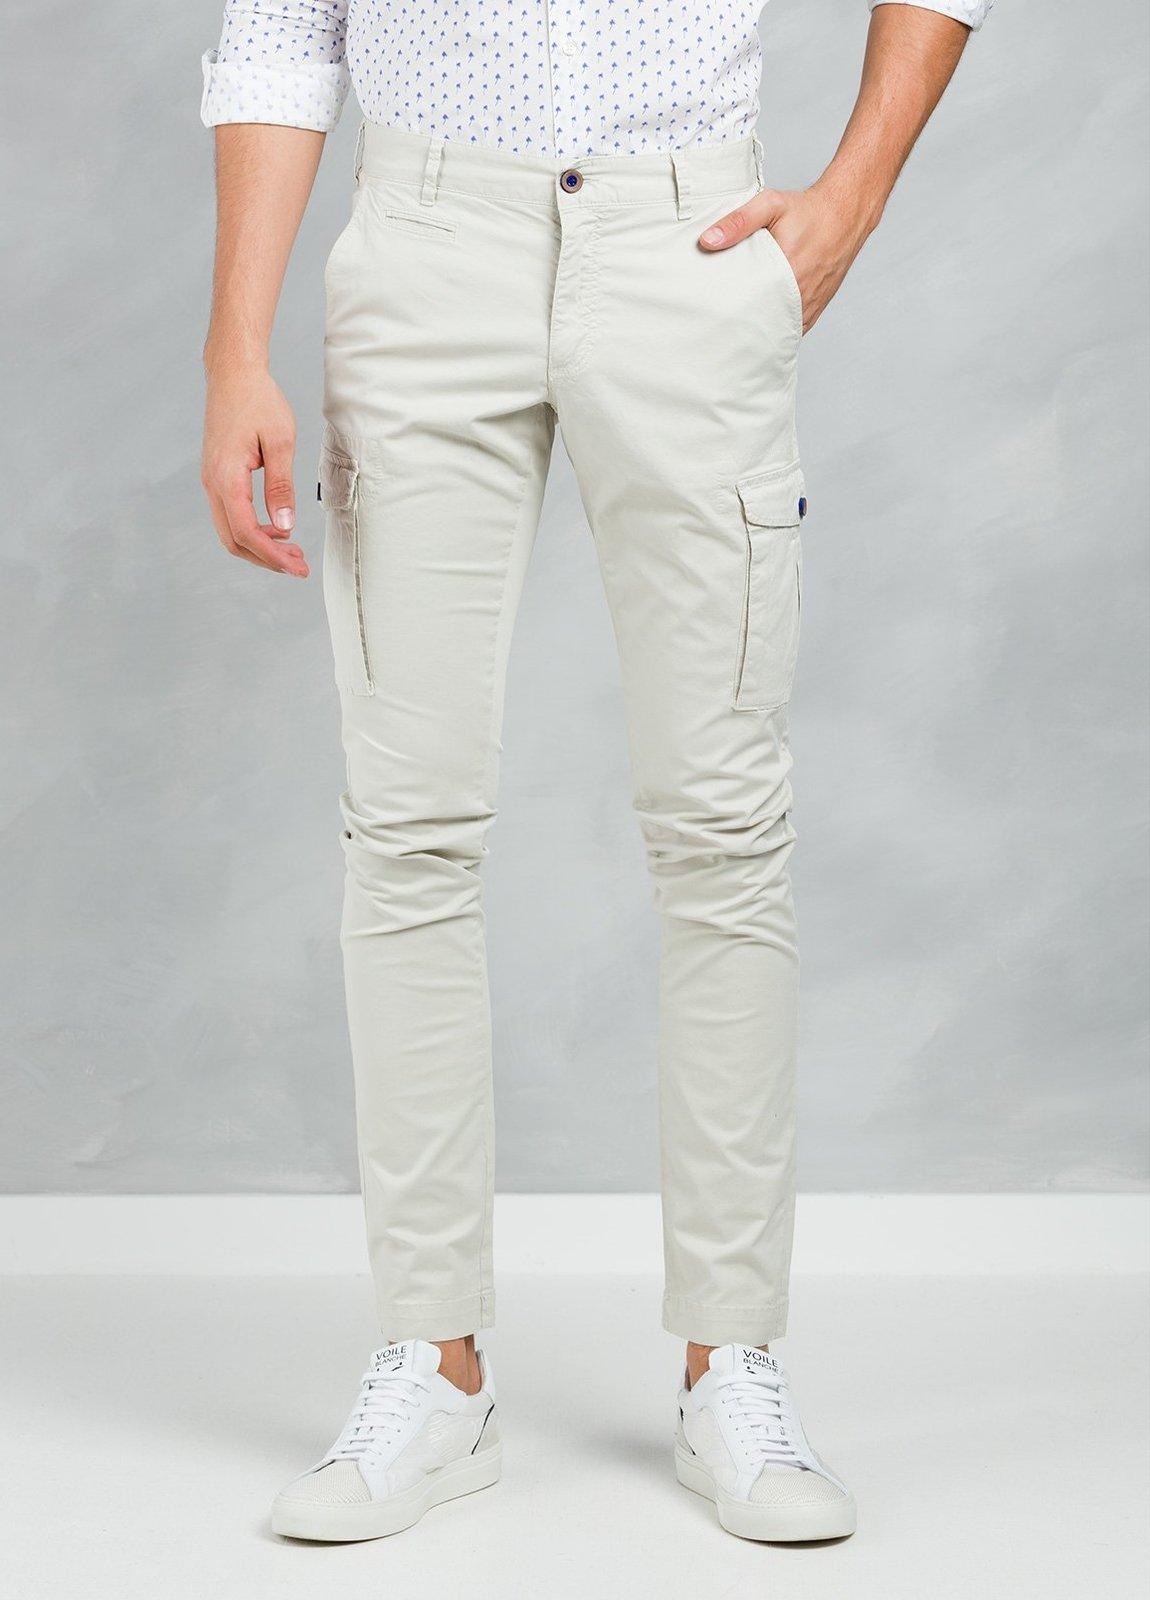 Pantalón Sport SLIM FIT modelo TONY con bolsillos laterales color beige, 97% Algodón 3% Elastán. - Ítem3